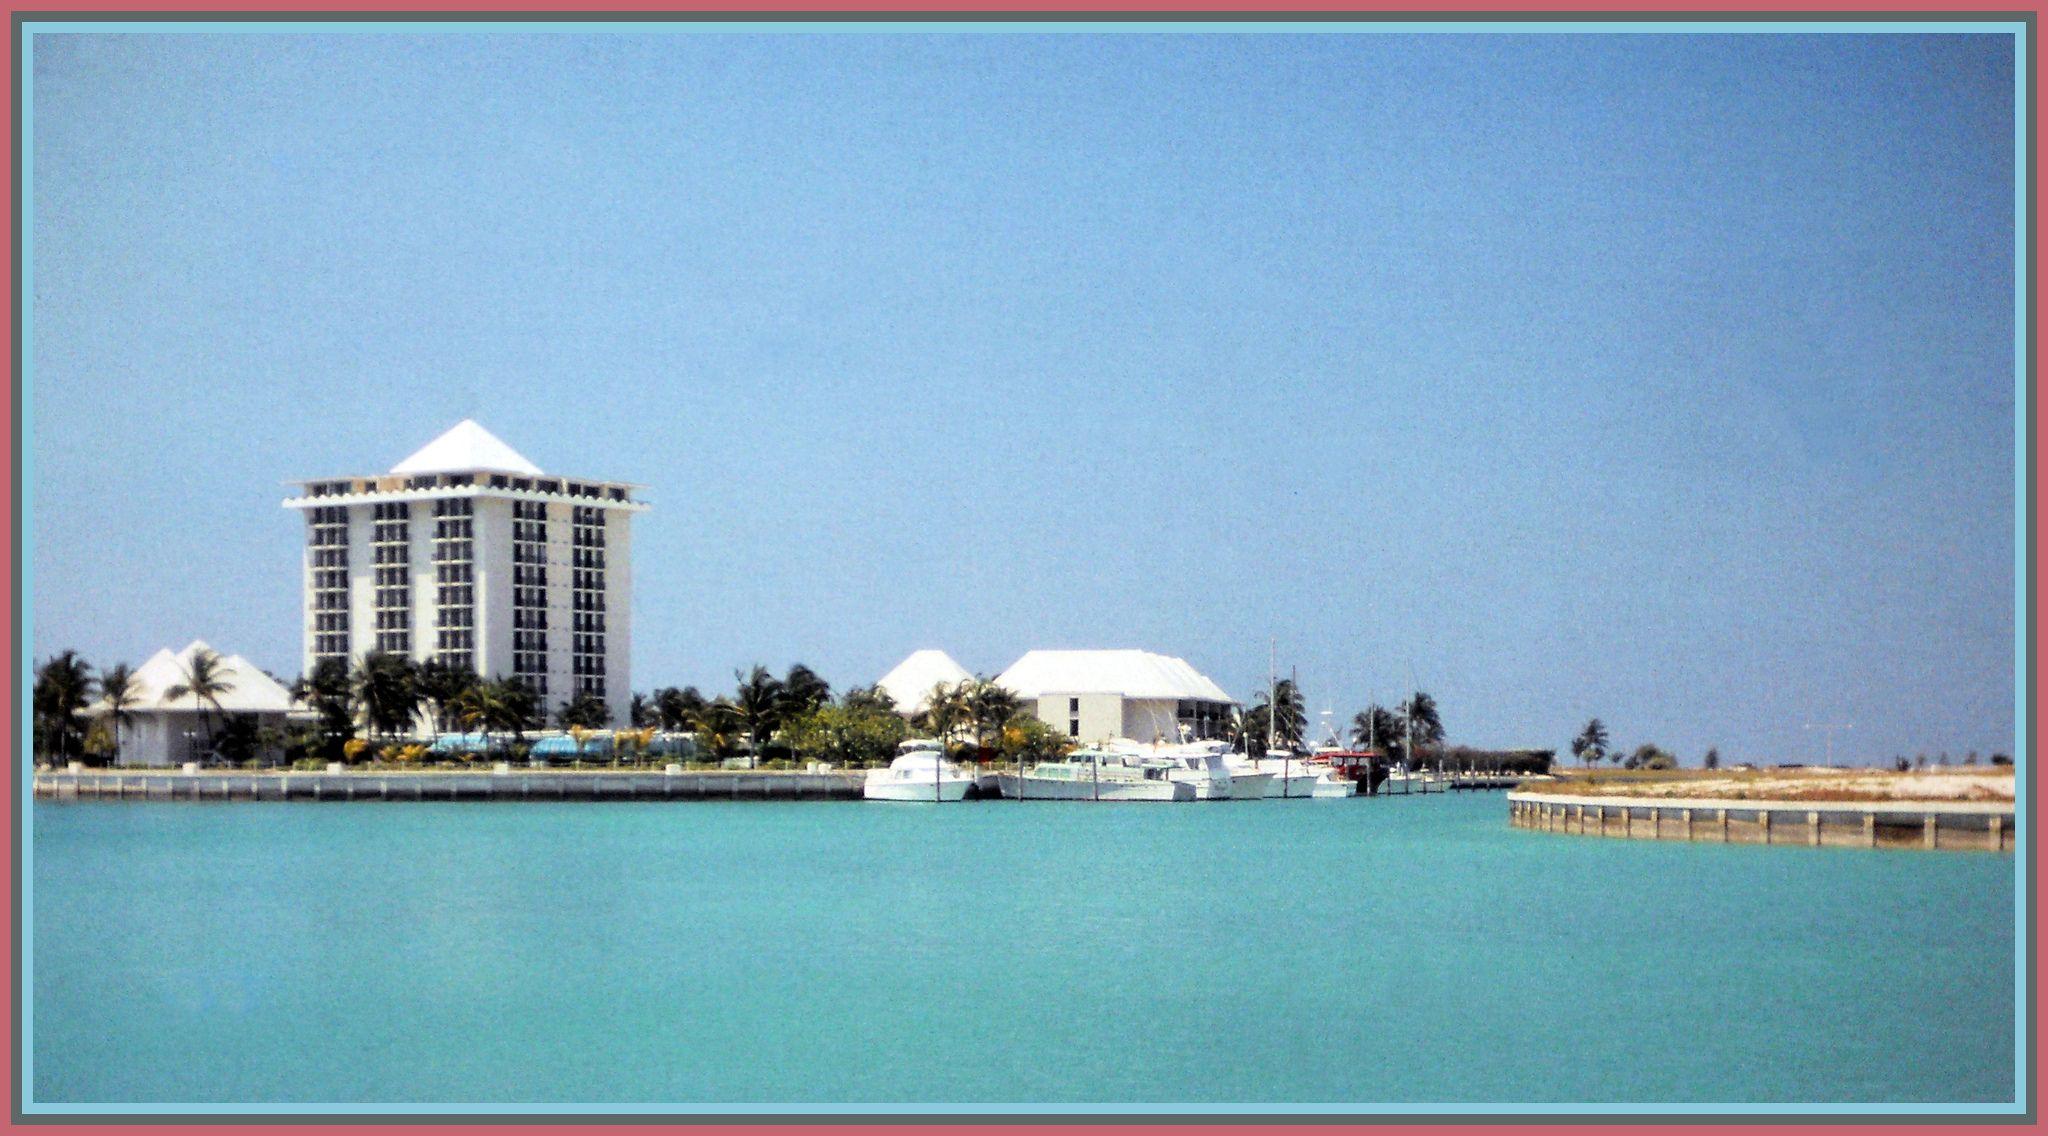 Xanadu - Freeport Bahamas 1978 Over 1000 Views